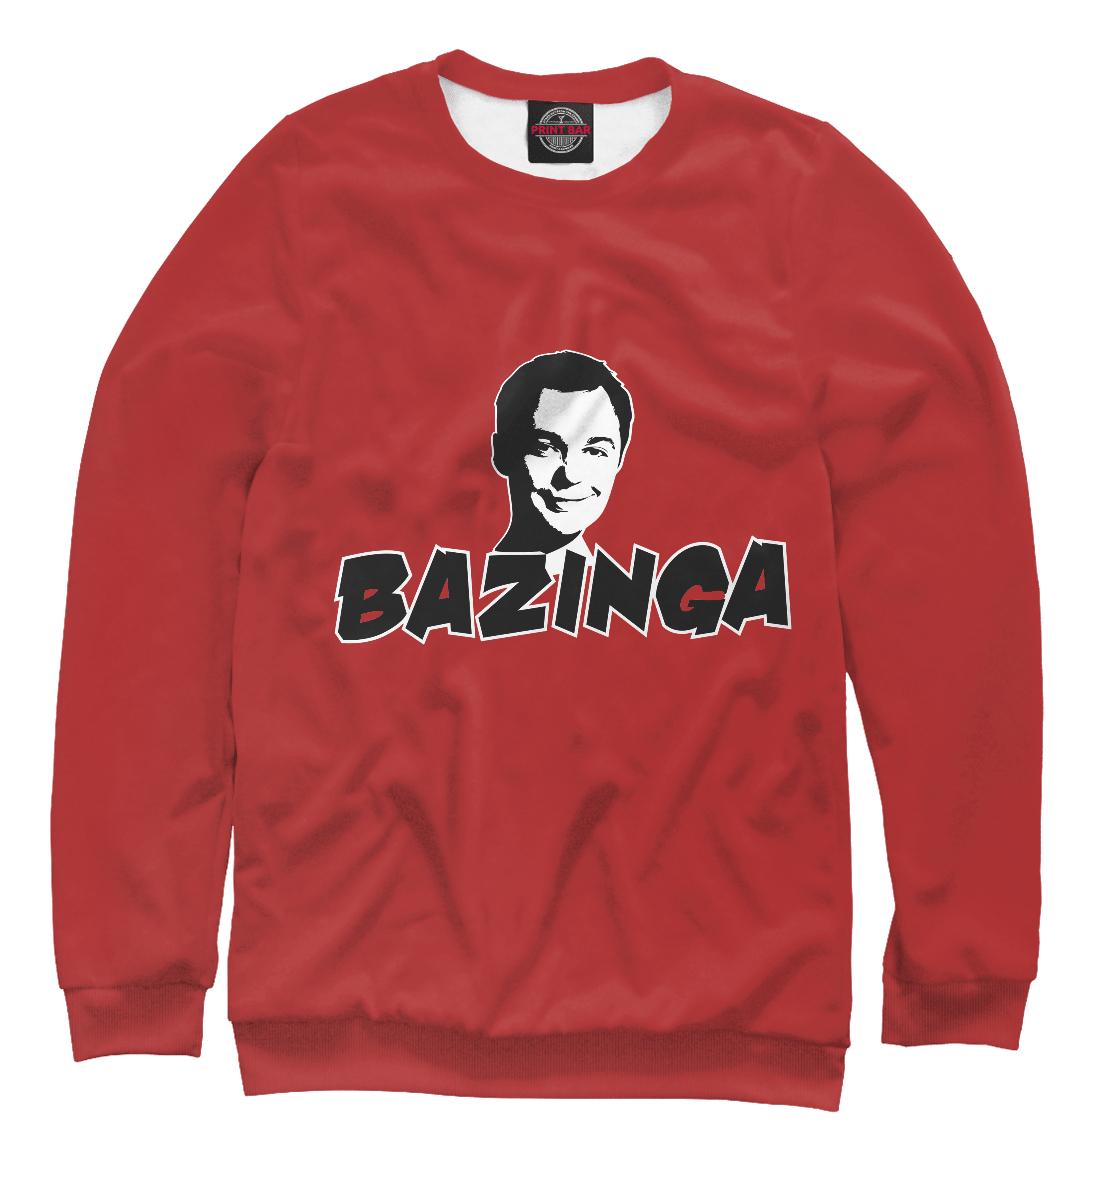 The Big Bang Theory, Printbar, Свитшоты, TEO-837293-swi-1  - купить со скидкой